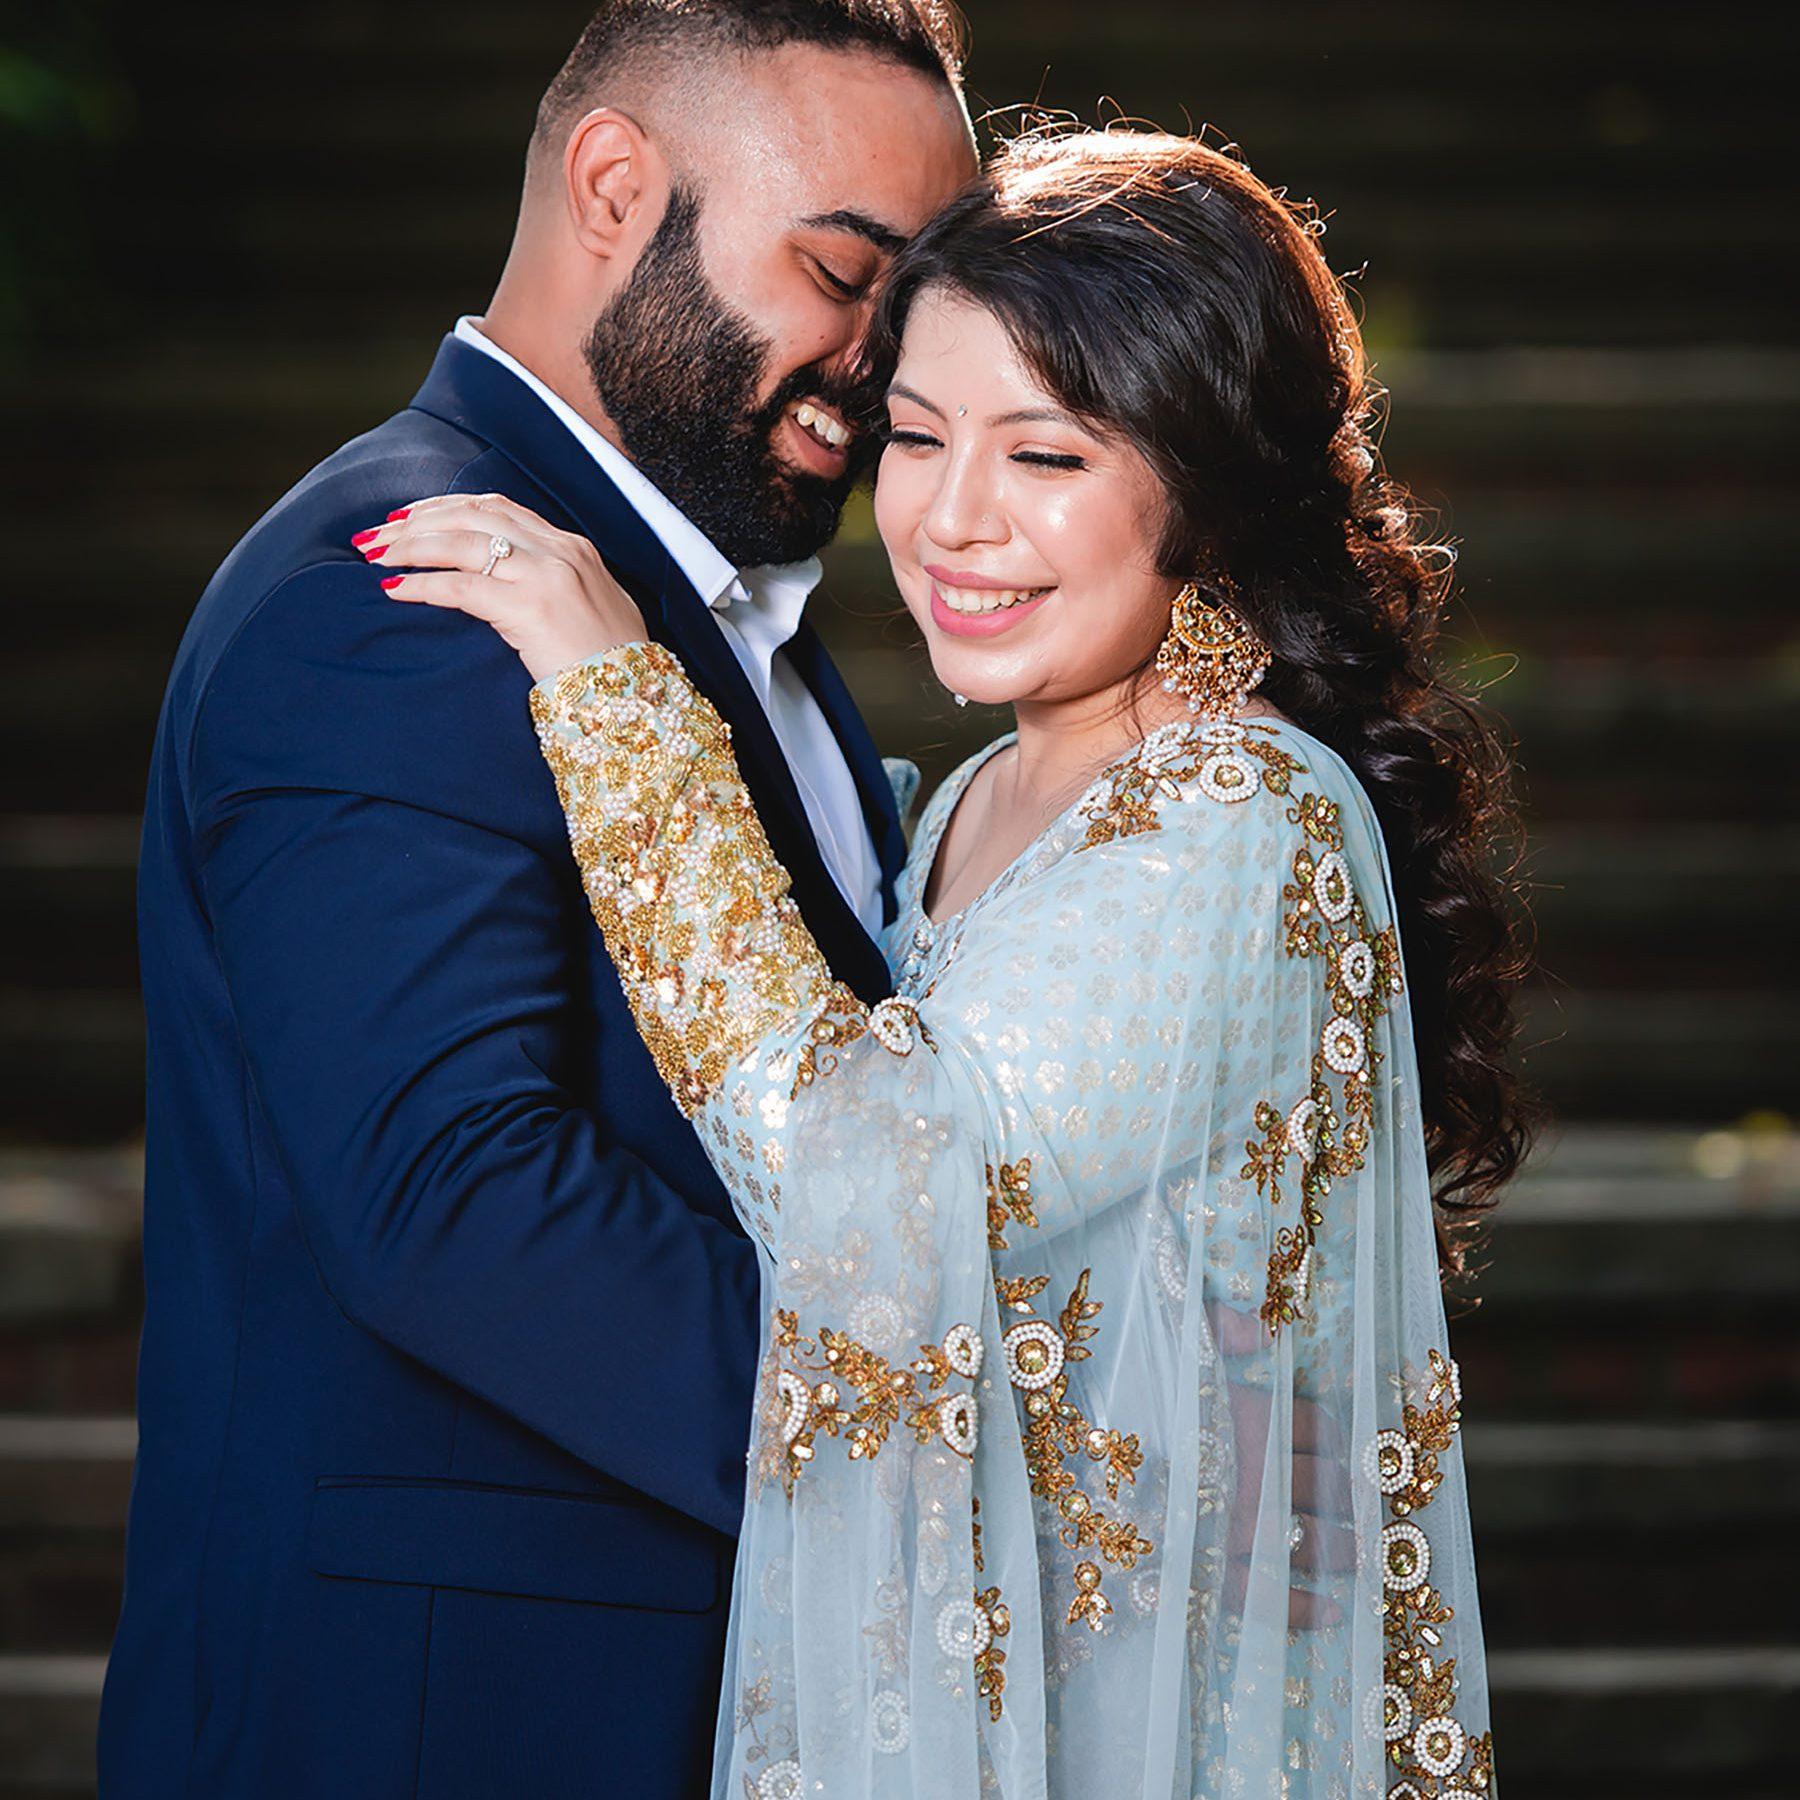 Pre-Wedding-Photo-Shoot-Glen-Cove-1800x1800 ENGAGEMENTS